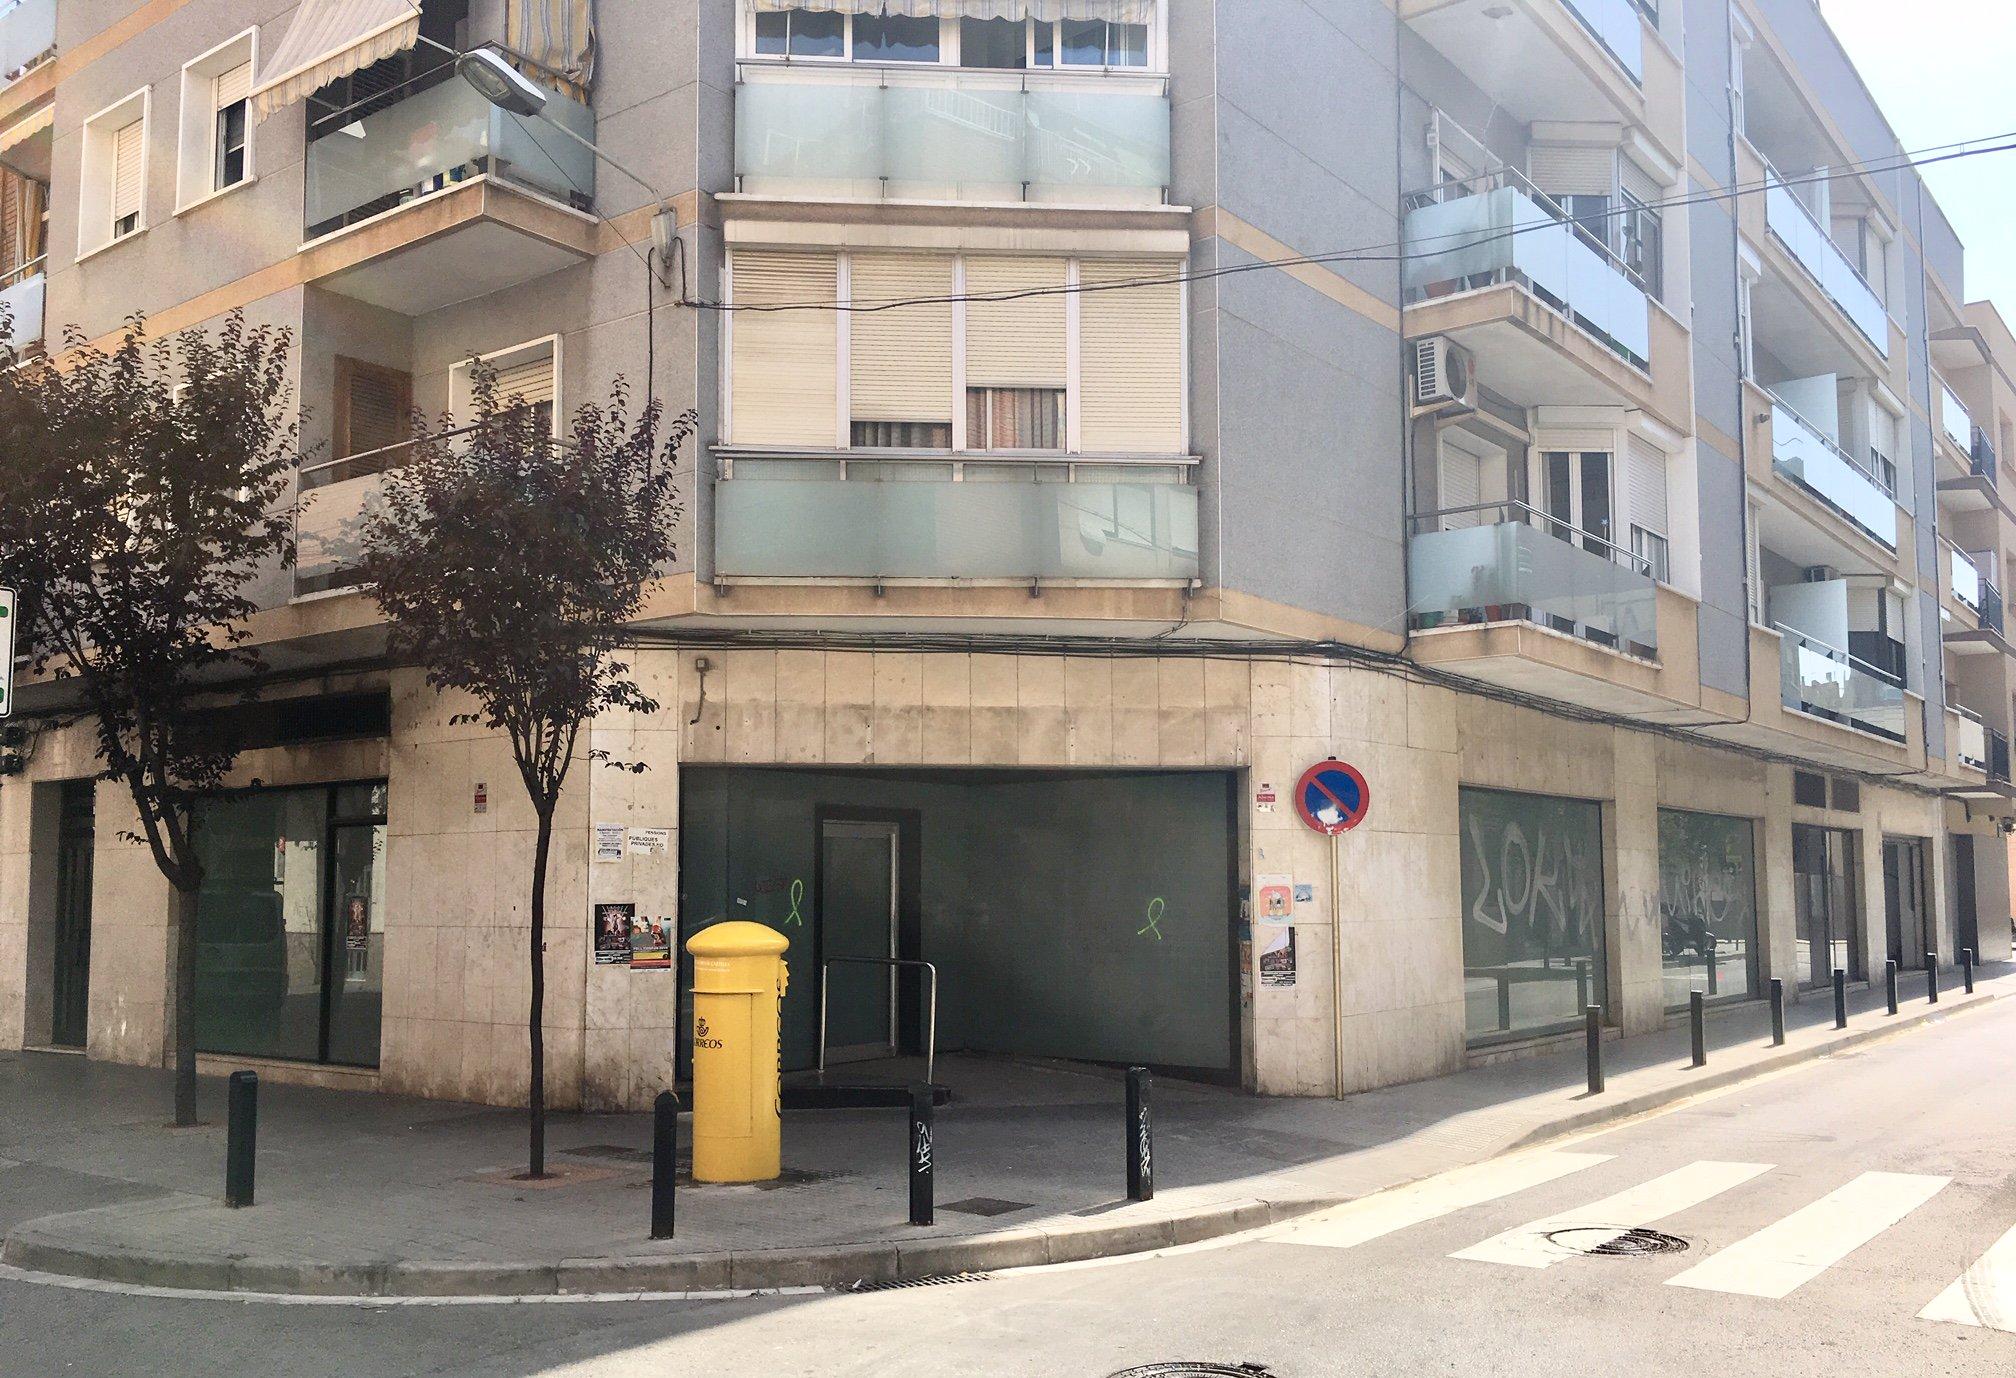 Local en venta en Cornellà de Llobregat, Barcelona, Calle San Jeronimo, 331.400 €, 61 m2